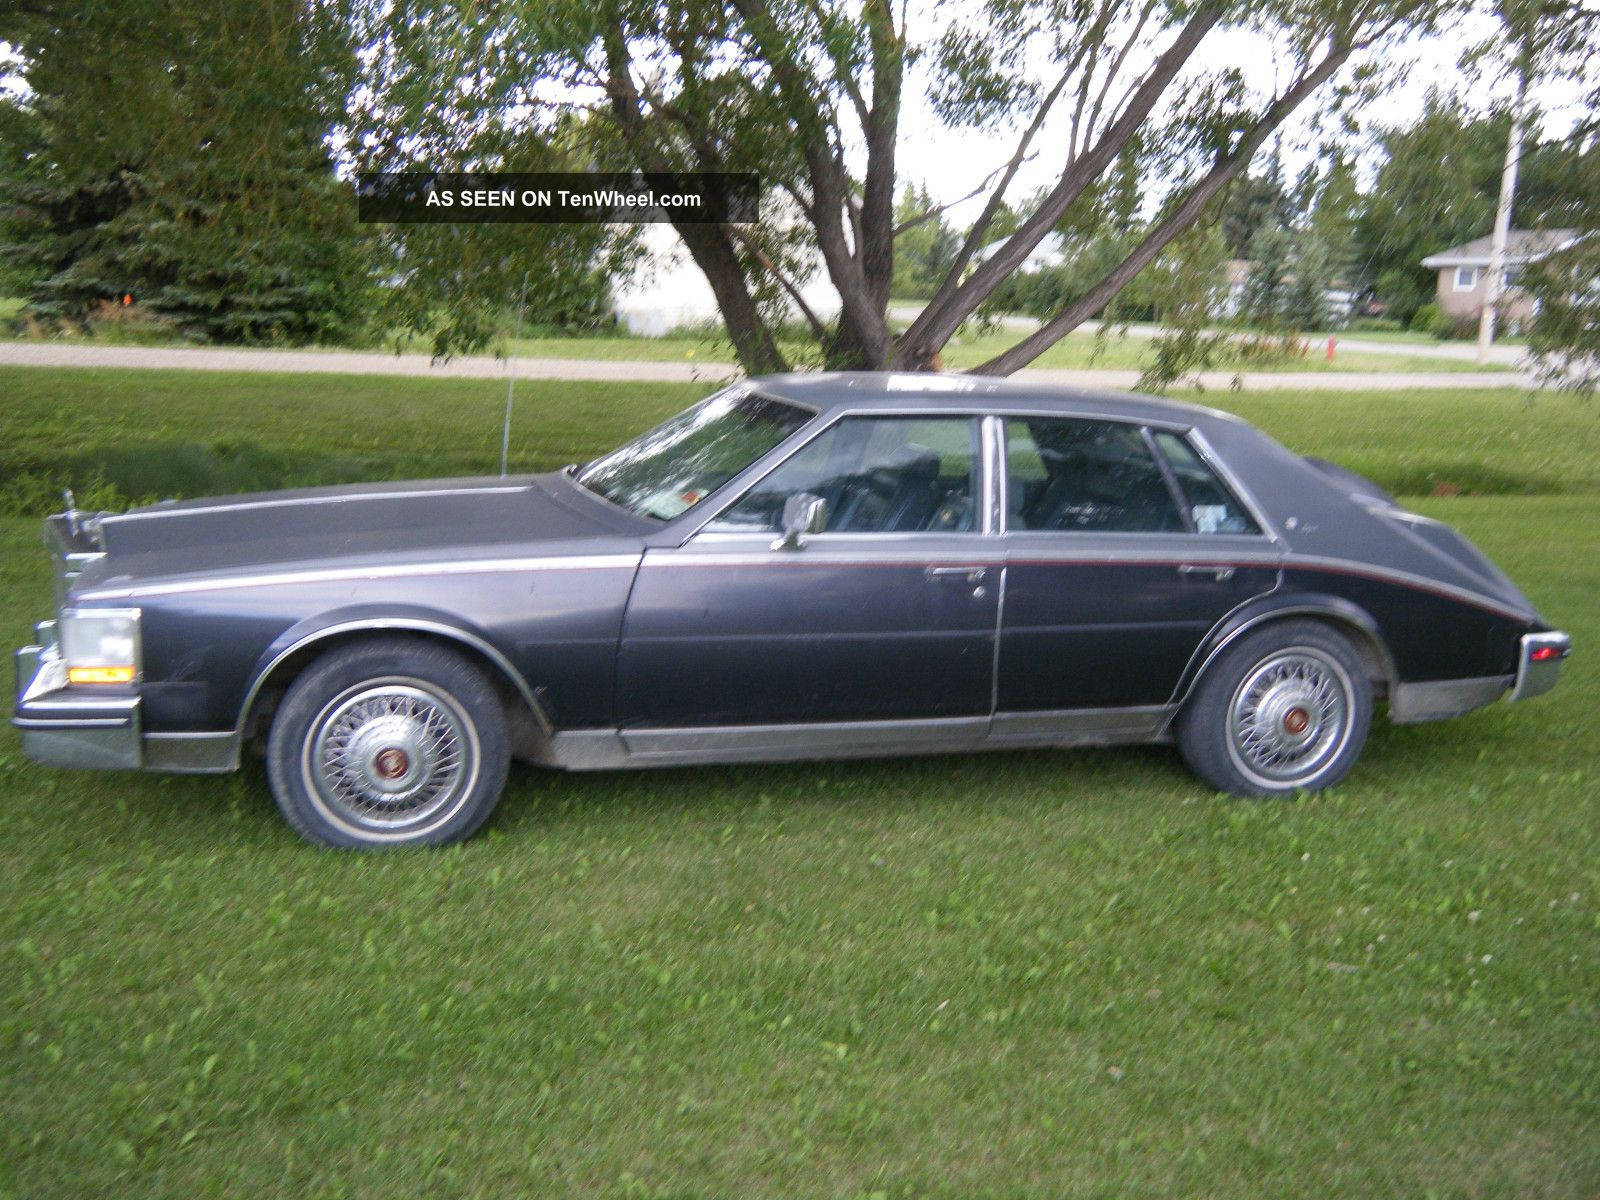 1985 Cadillac Seville Elegante Sedan 4 Door 4 1l